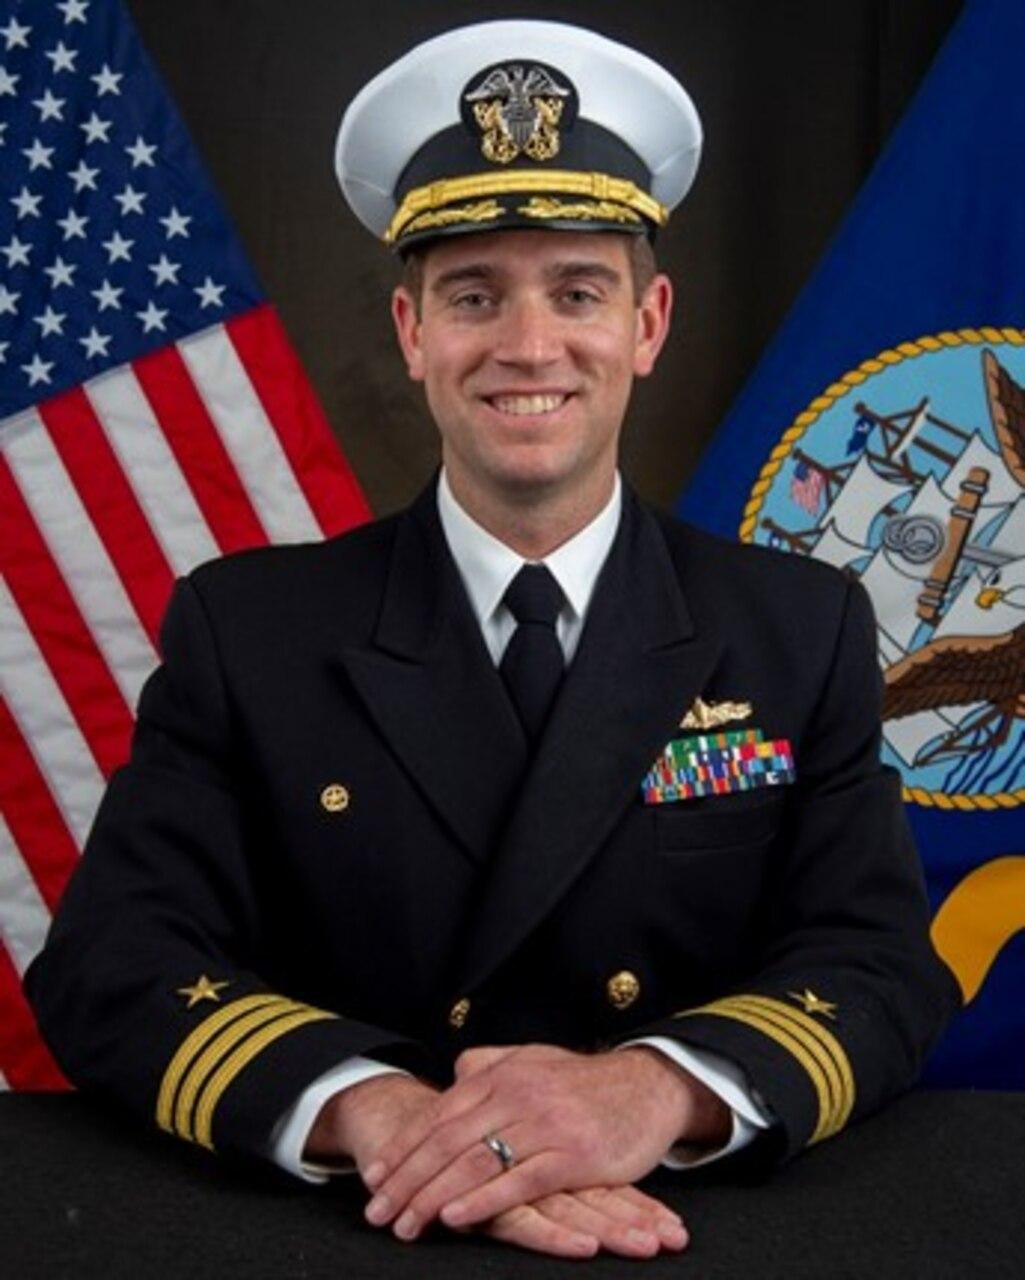 Commander James F. Hopp